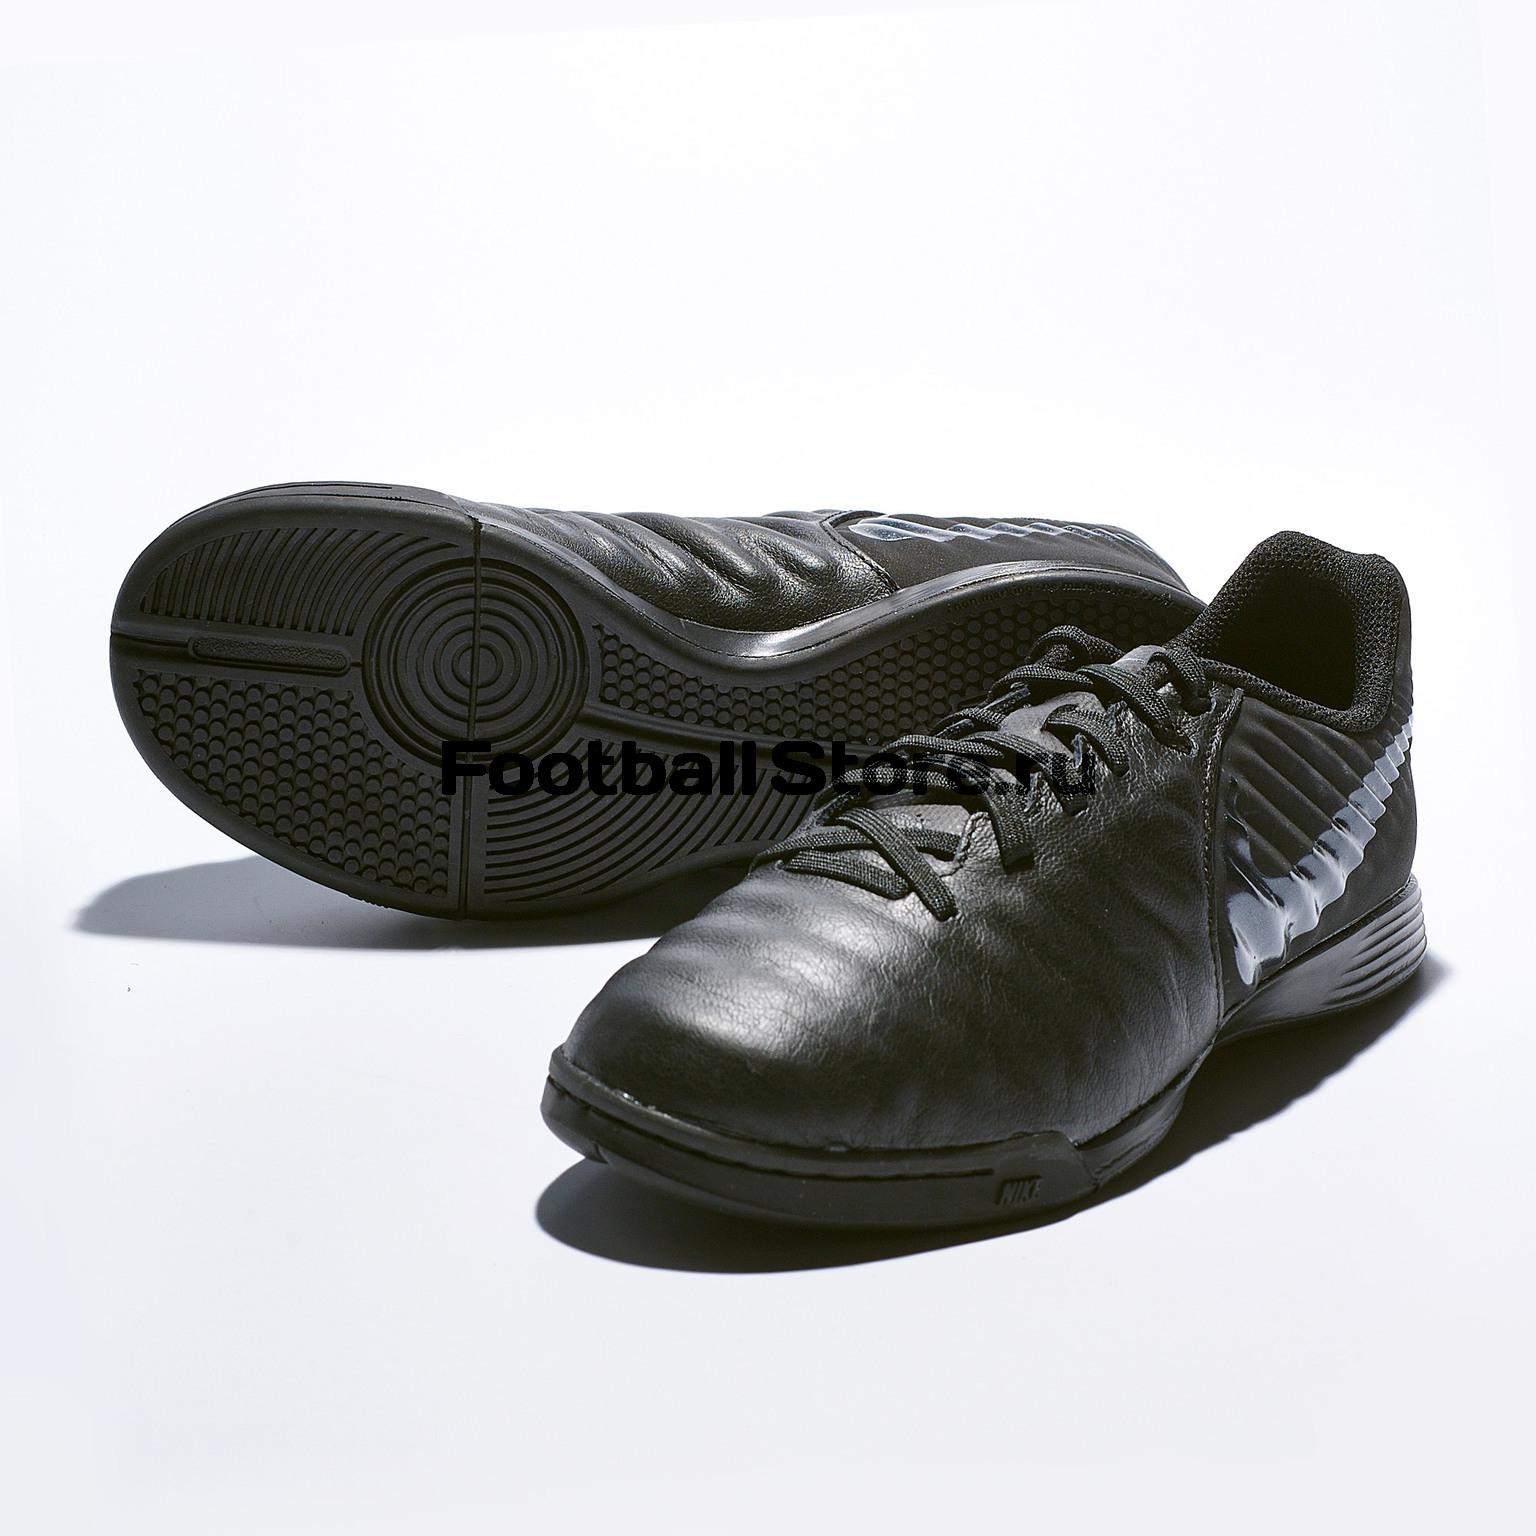 Футзалки детские Nike LegendX 7 Academy IC AH7257-001 цена и фото